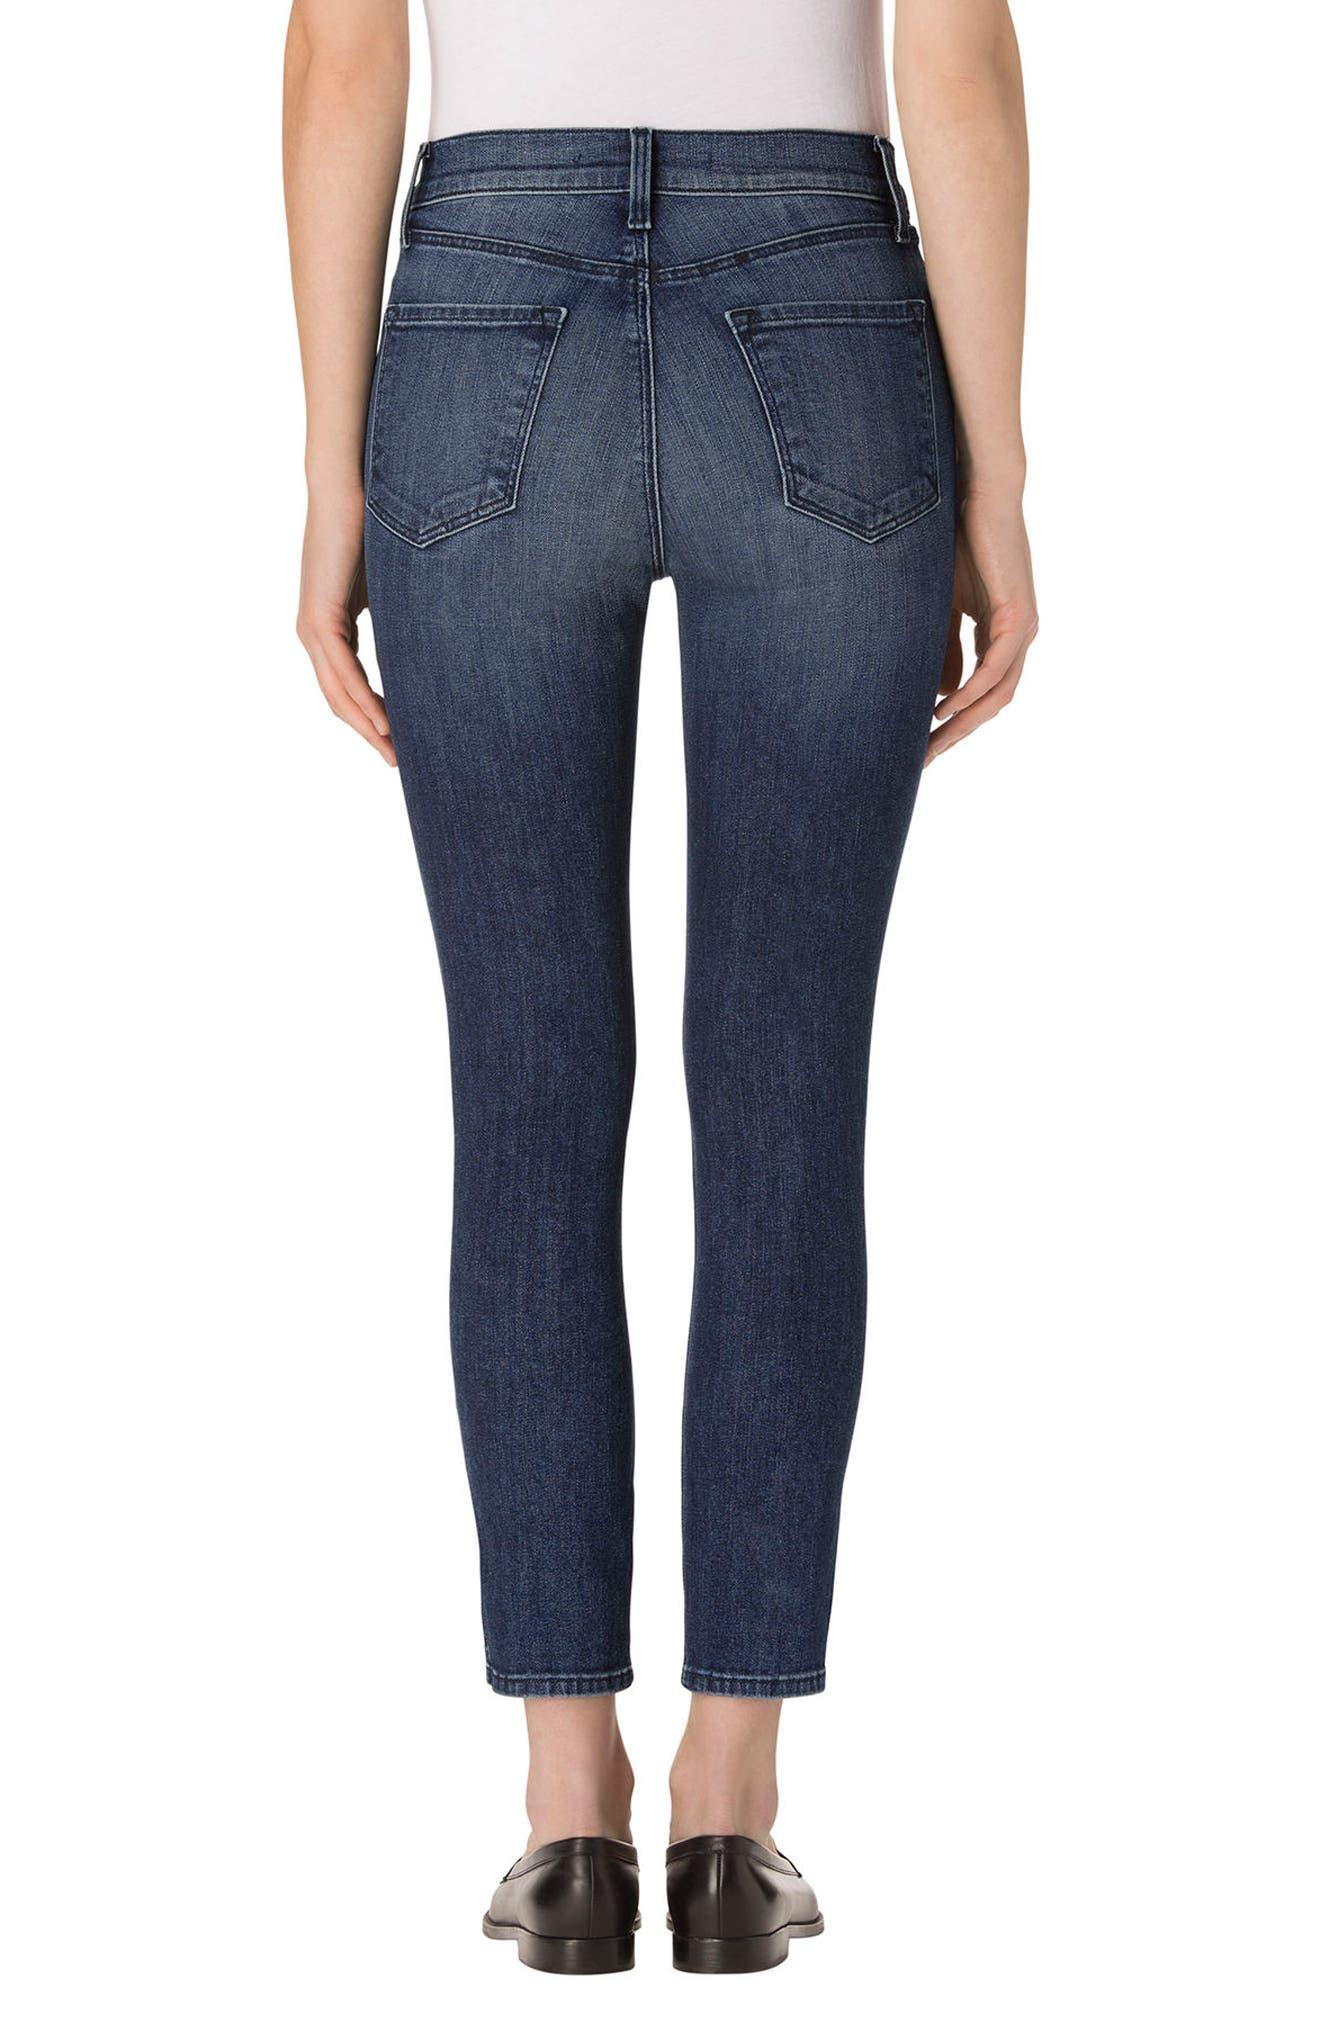 Alana High Waist Crop Skinny Jeans,                             Alternate thumbnail 2, color,                             403